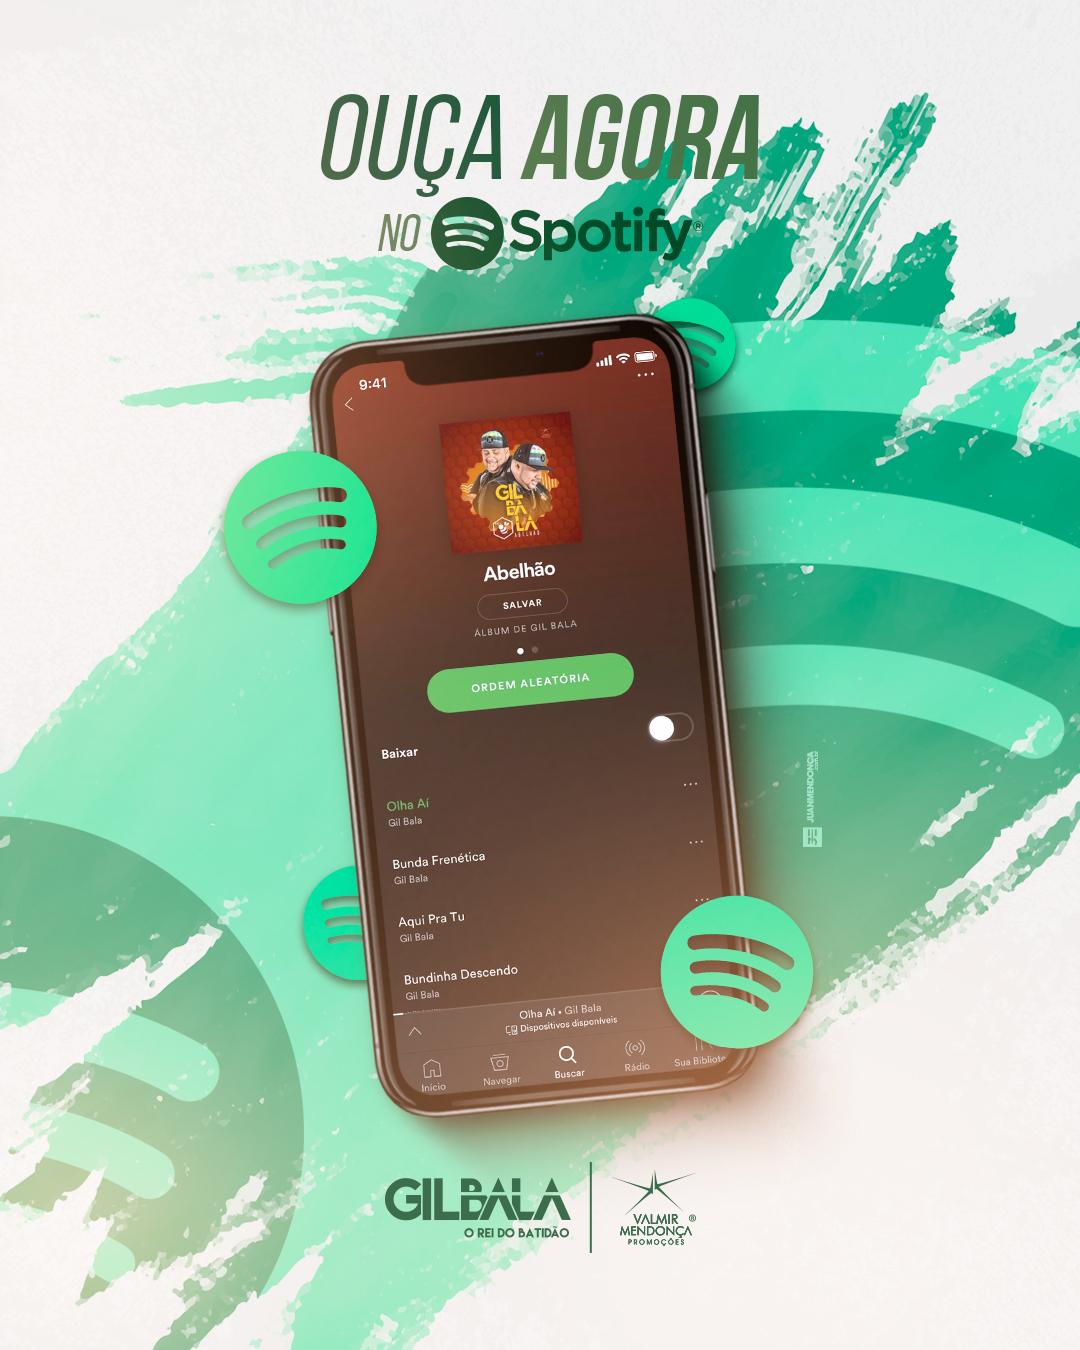 Ouça Agora no Spotify - [Feed]